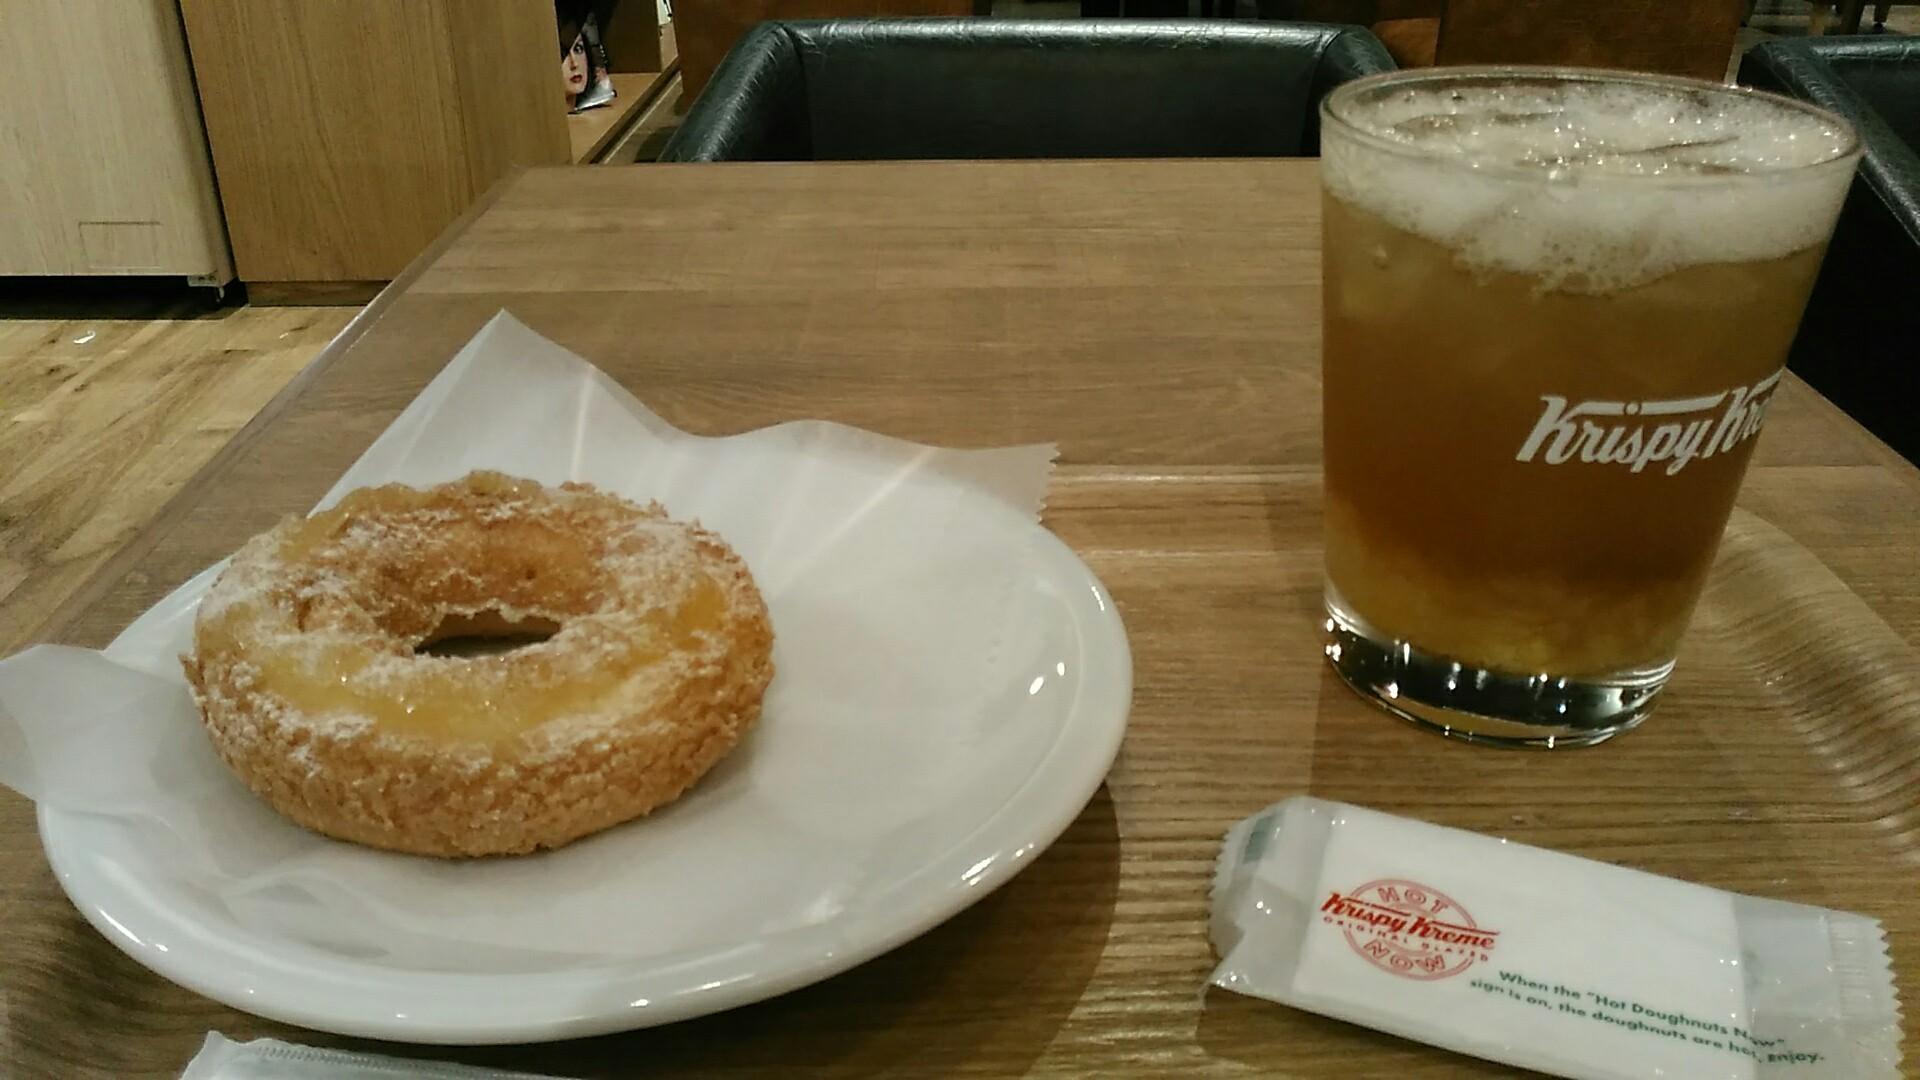 Krispy Kreme Doughnuts(クリスピー・クリーム・ドーナツ) 『ジェリーinソーダ パイナップルティー』_a0326295_14474253.jpg